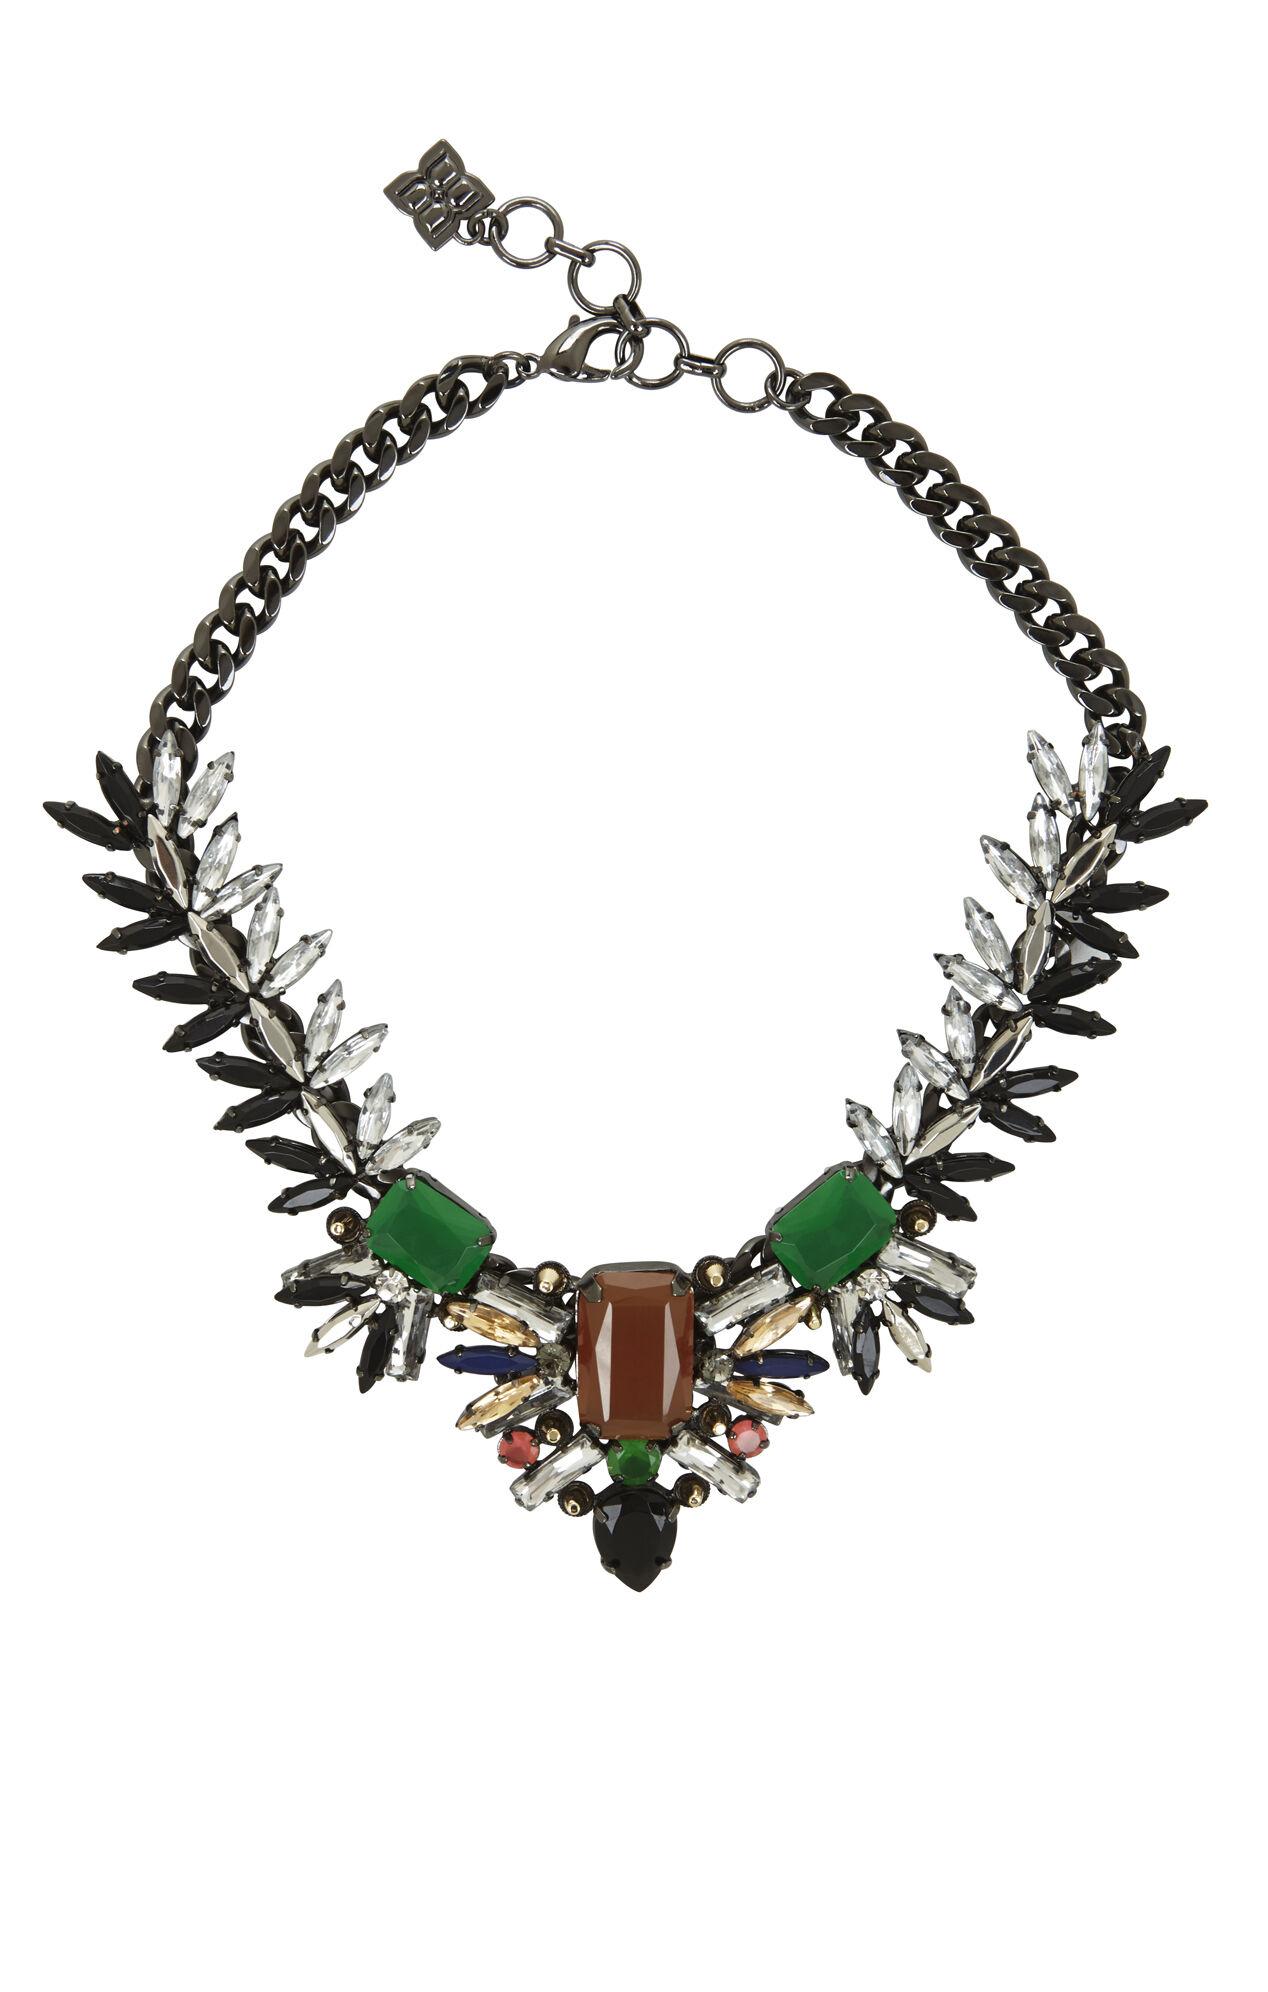 Spiked Gemstone Necklace